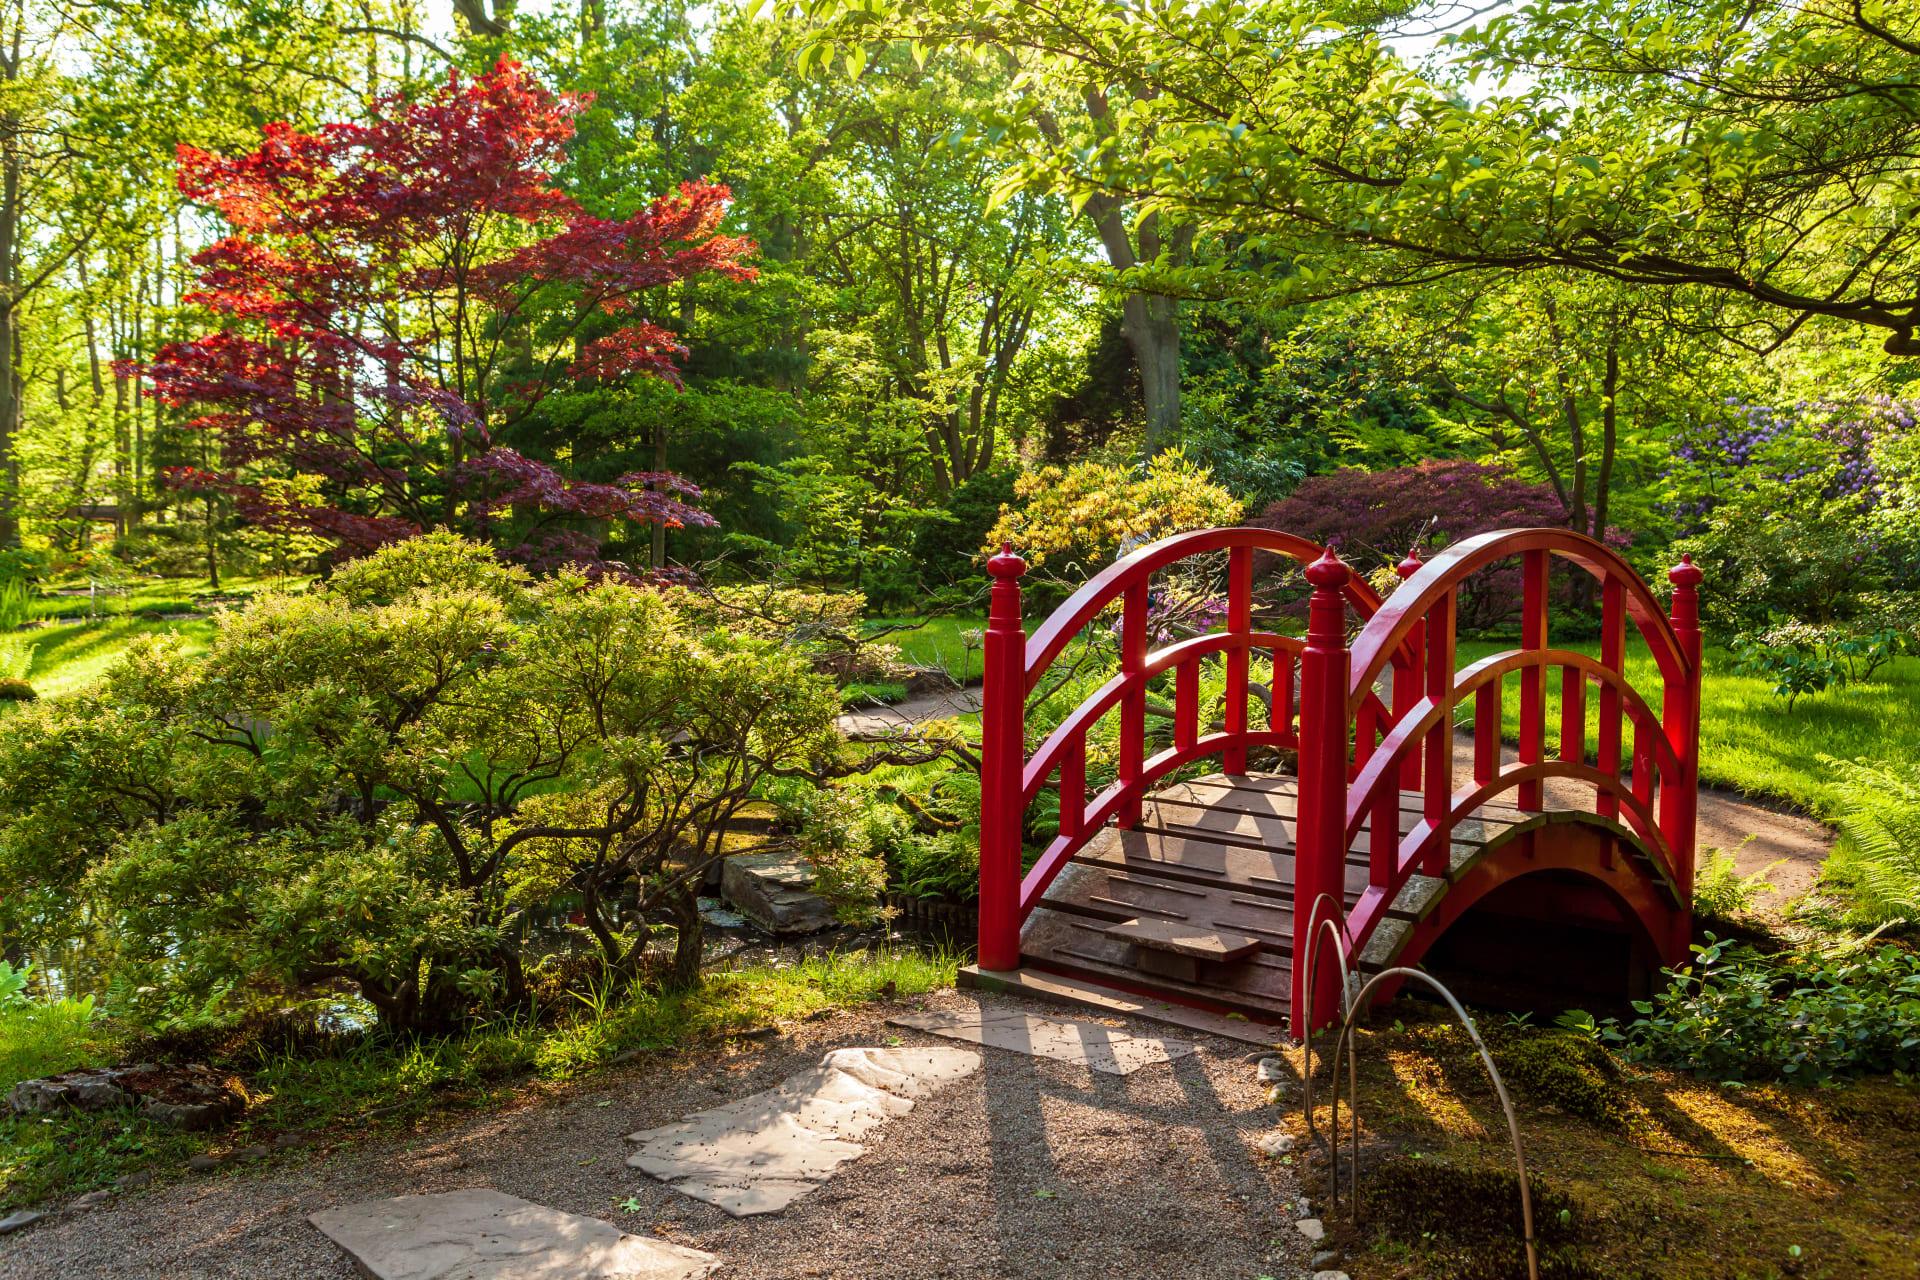 The Hague - Scenic Japanese Garden in Clingendael Estate The Hague